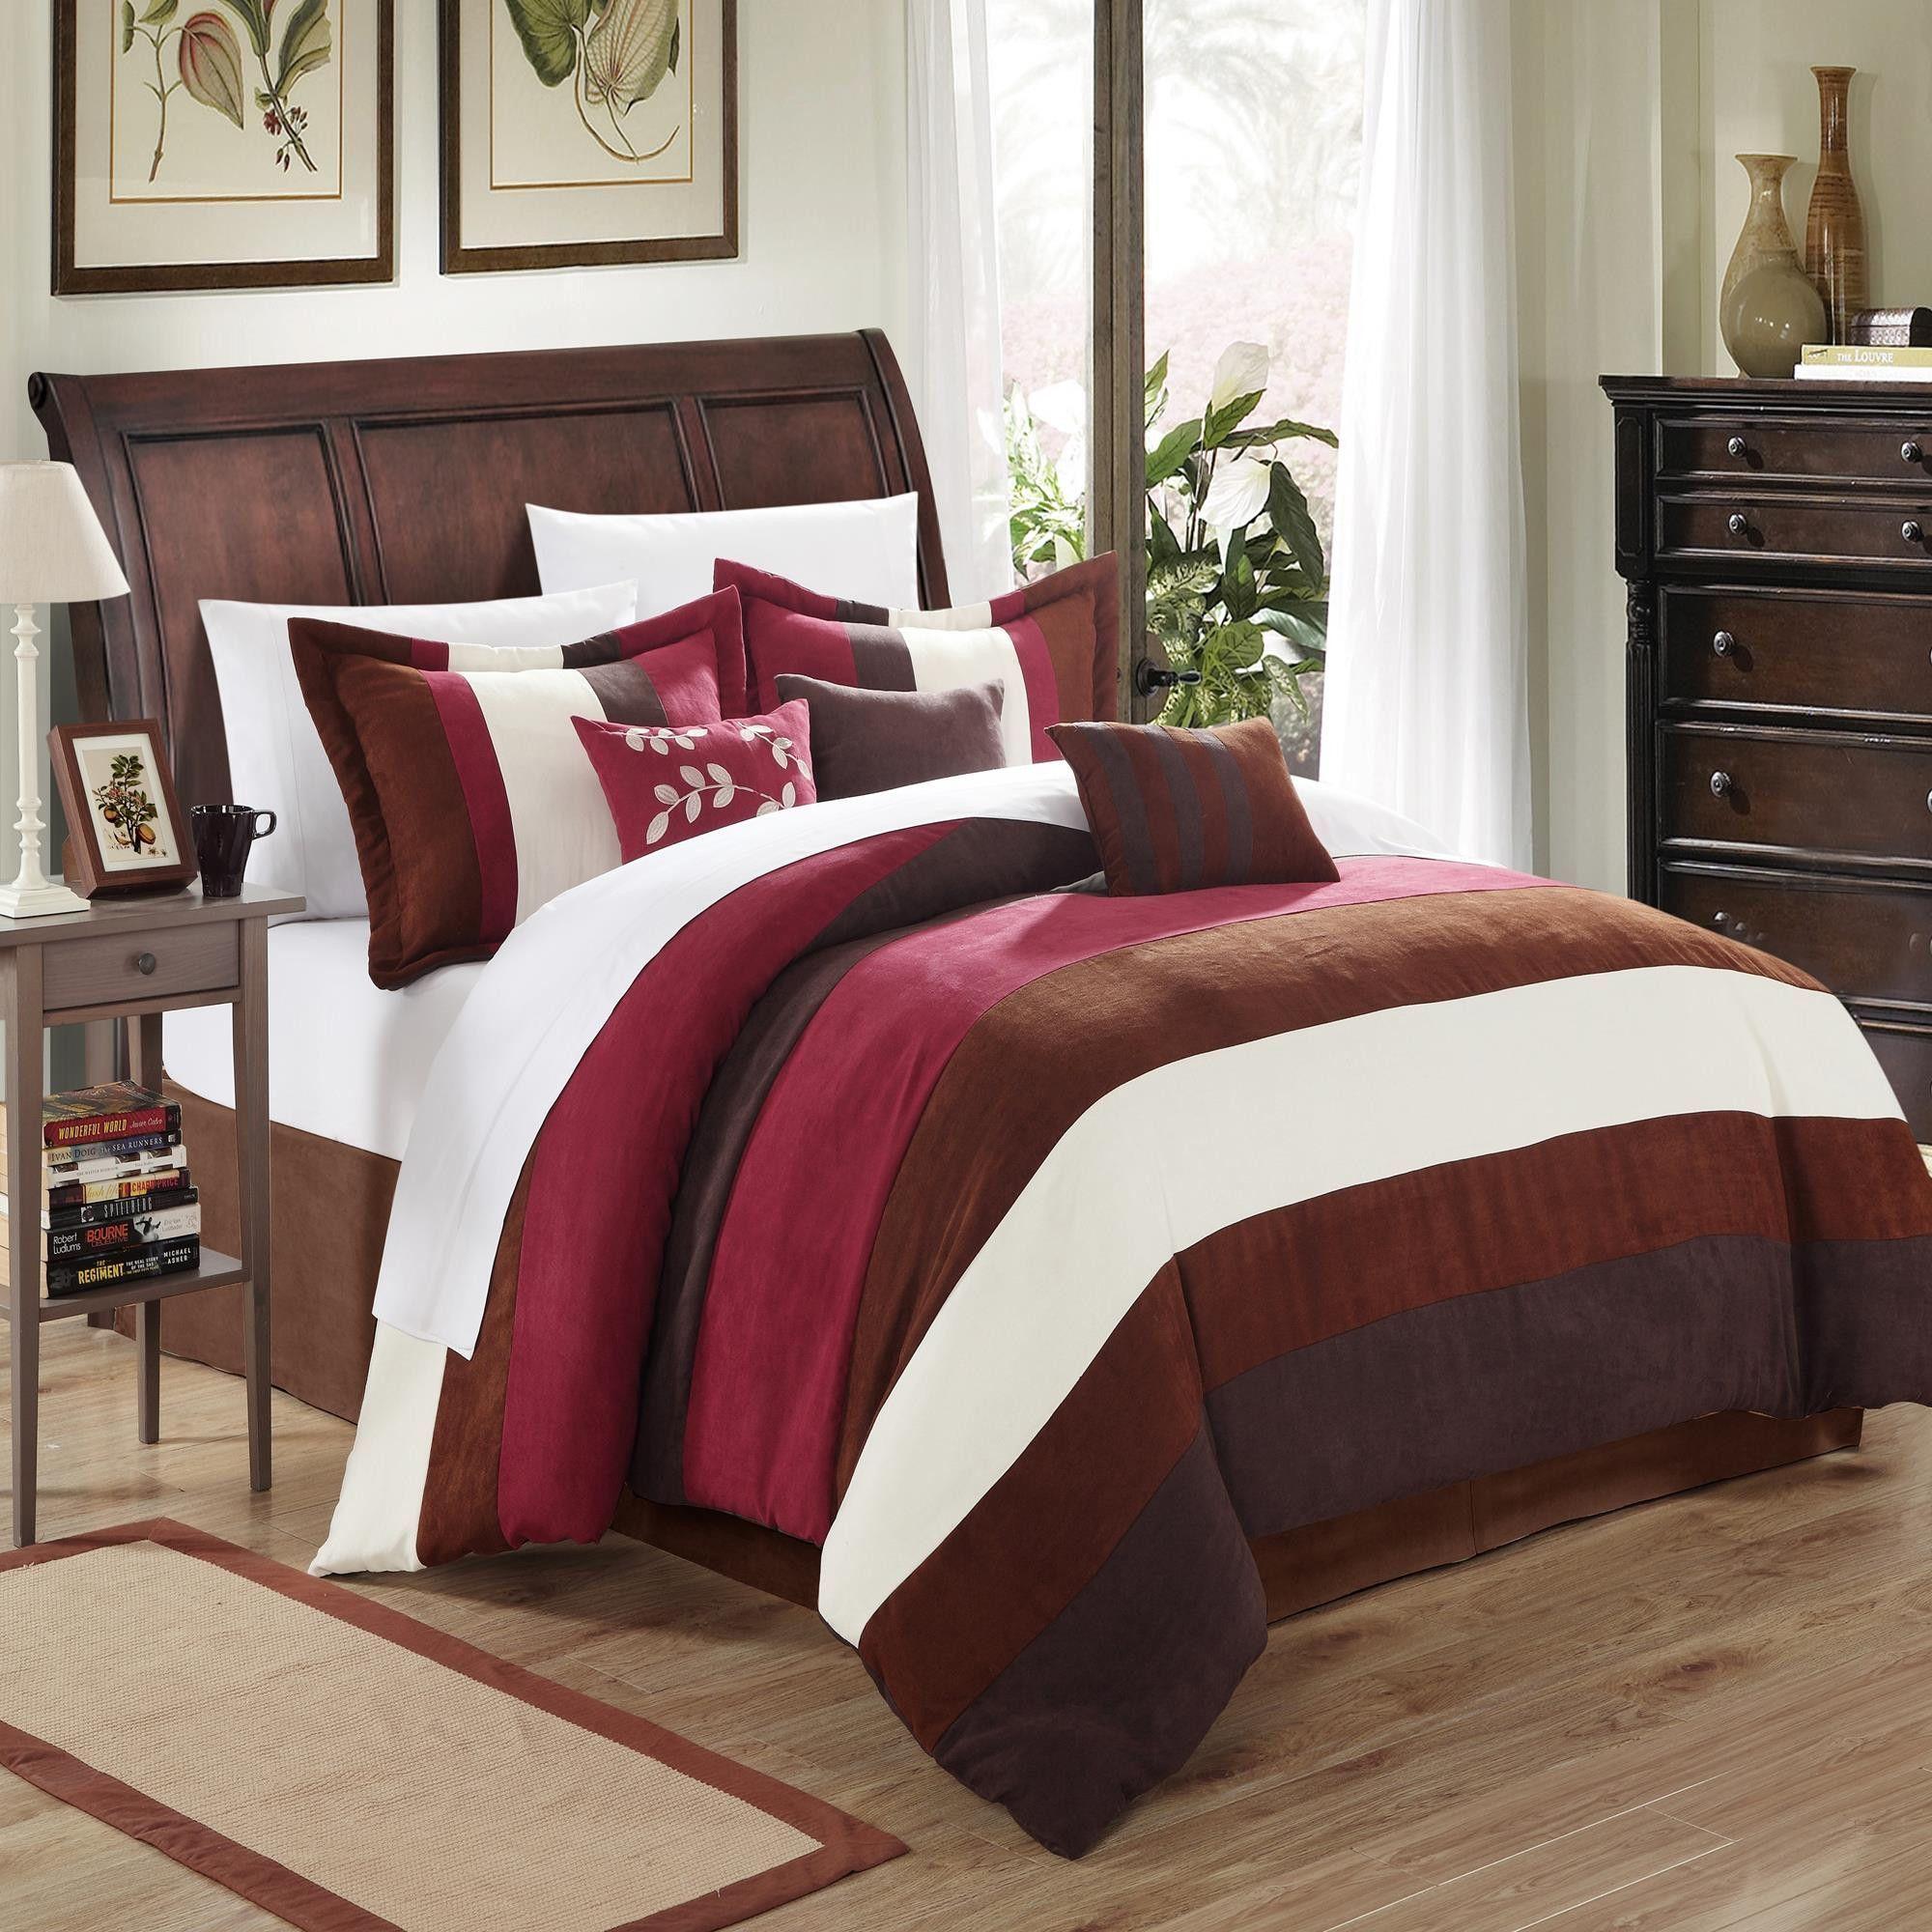 Cathy Microsuede Burgundy, Brown, Ivory 11 Piece Comforter